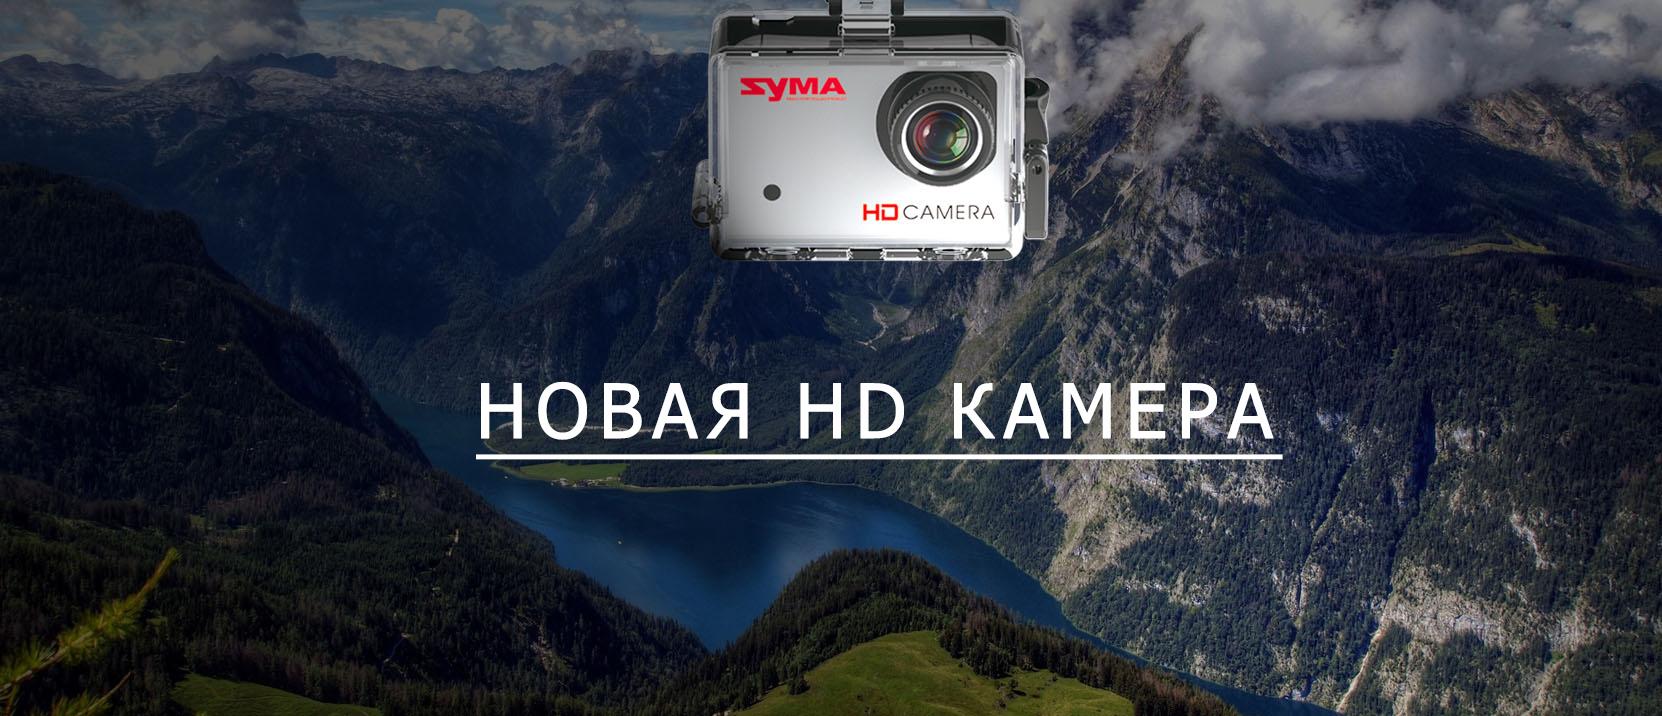 SYMA X8G